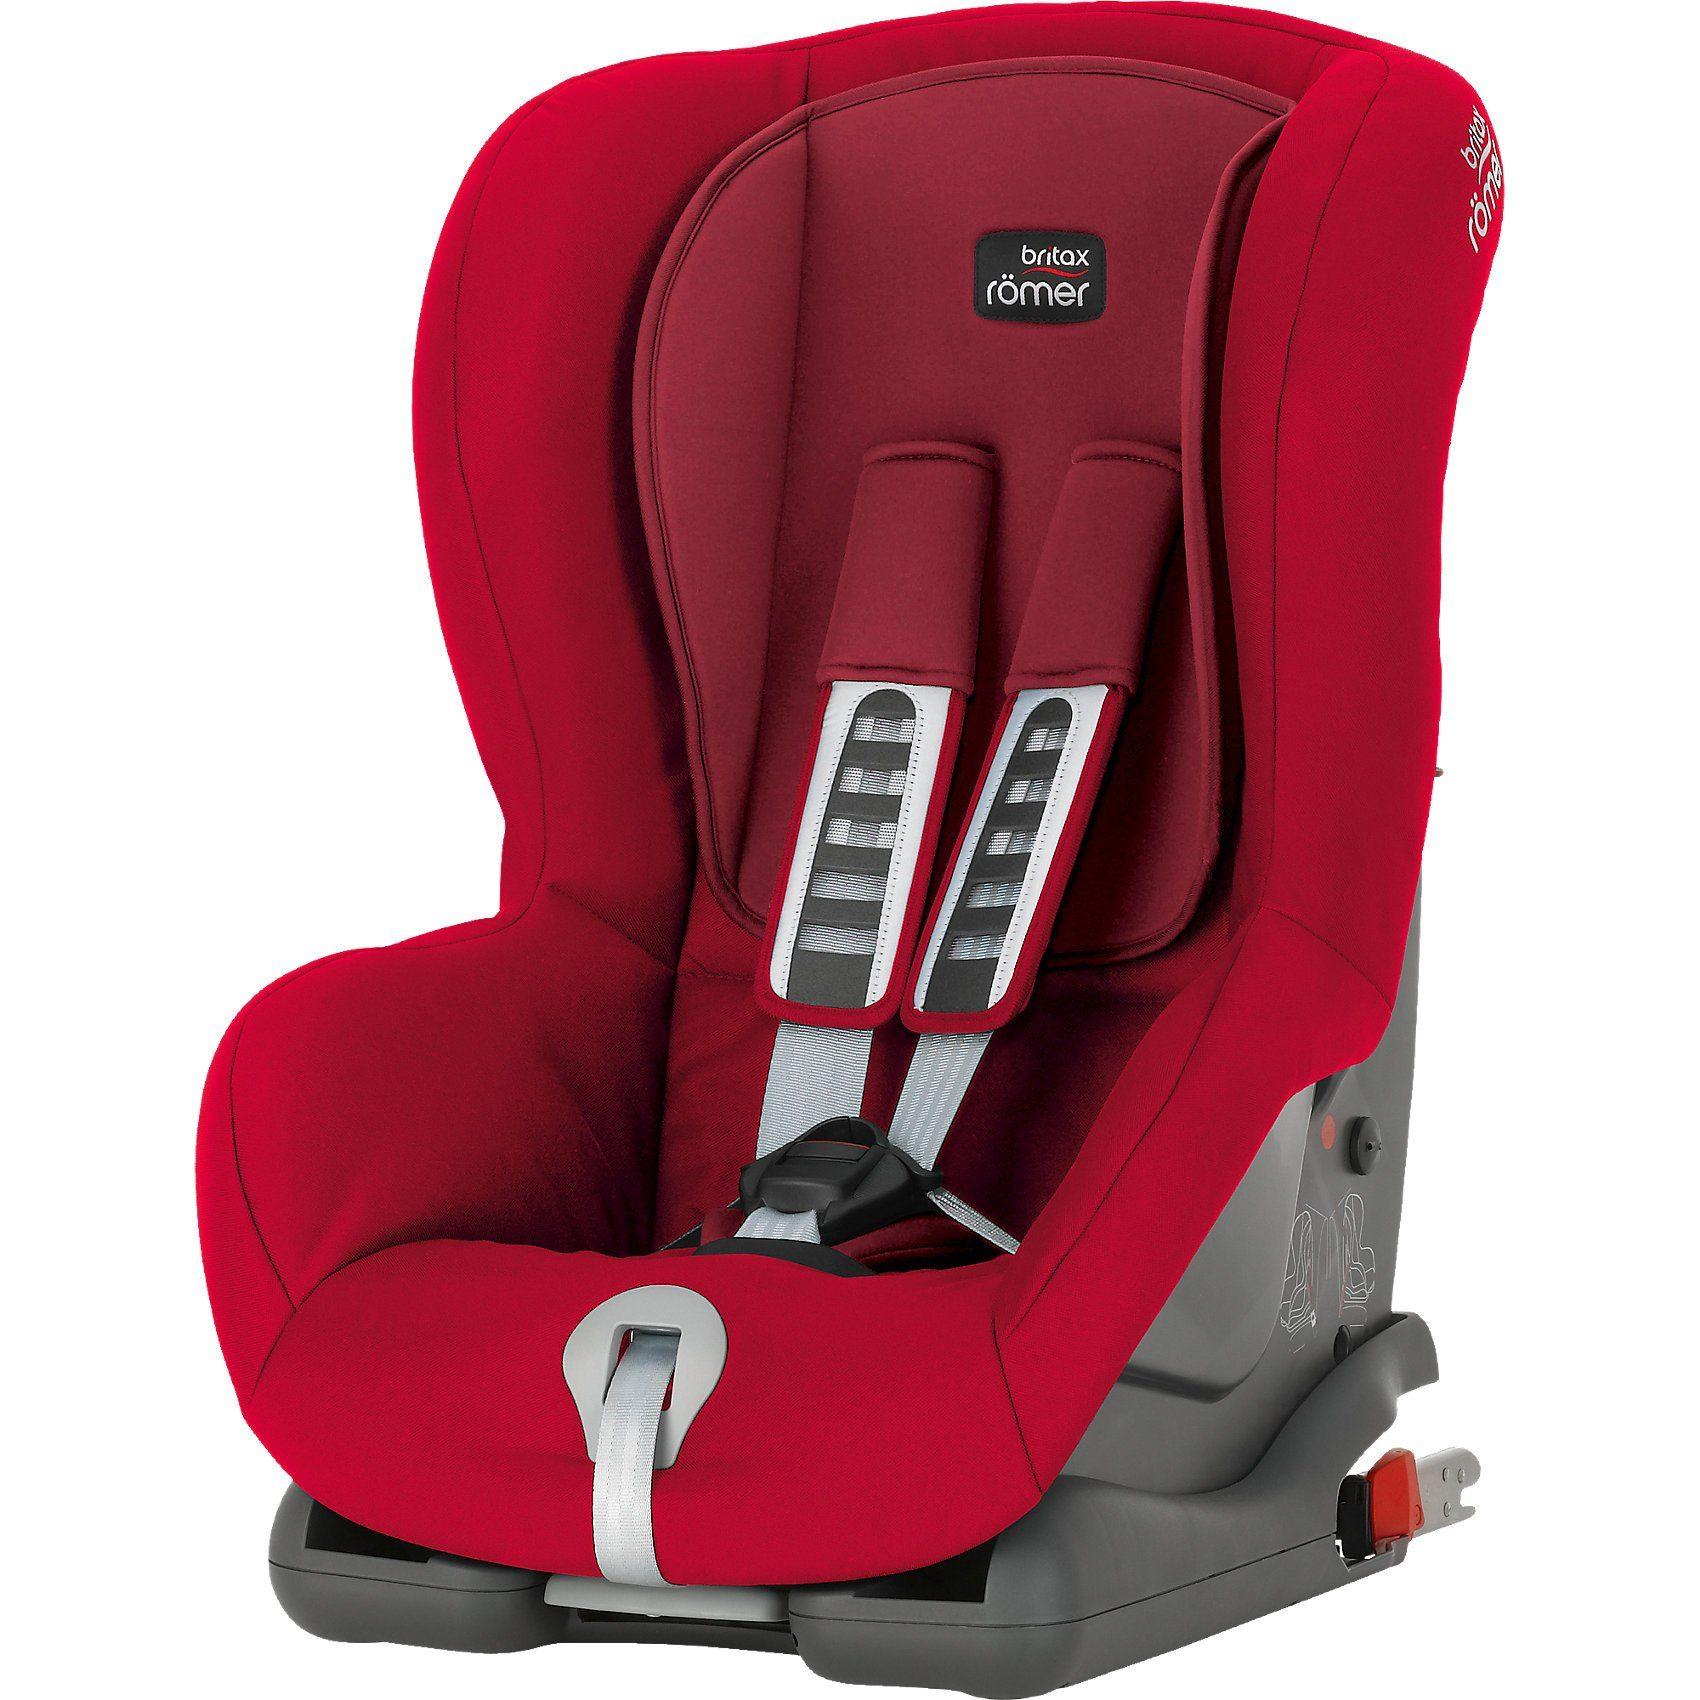 Britax Römer Auto-Kindersitz Duo Plus, Flame Red, 2016